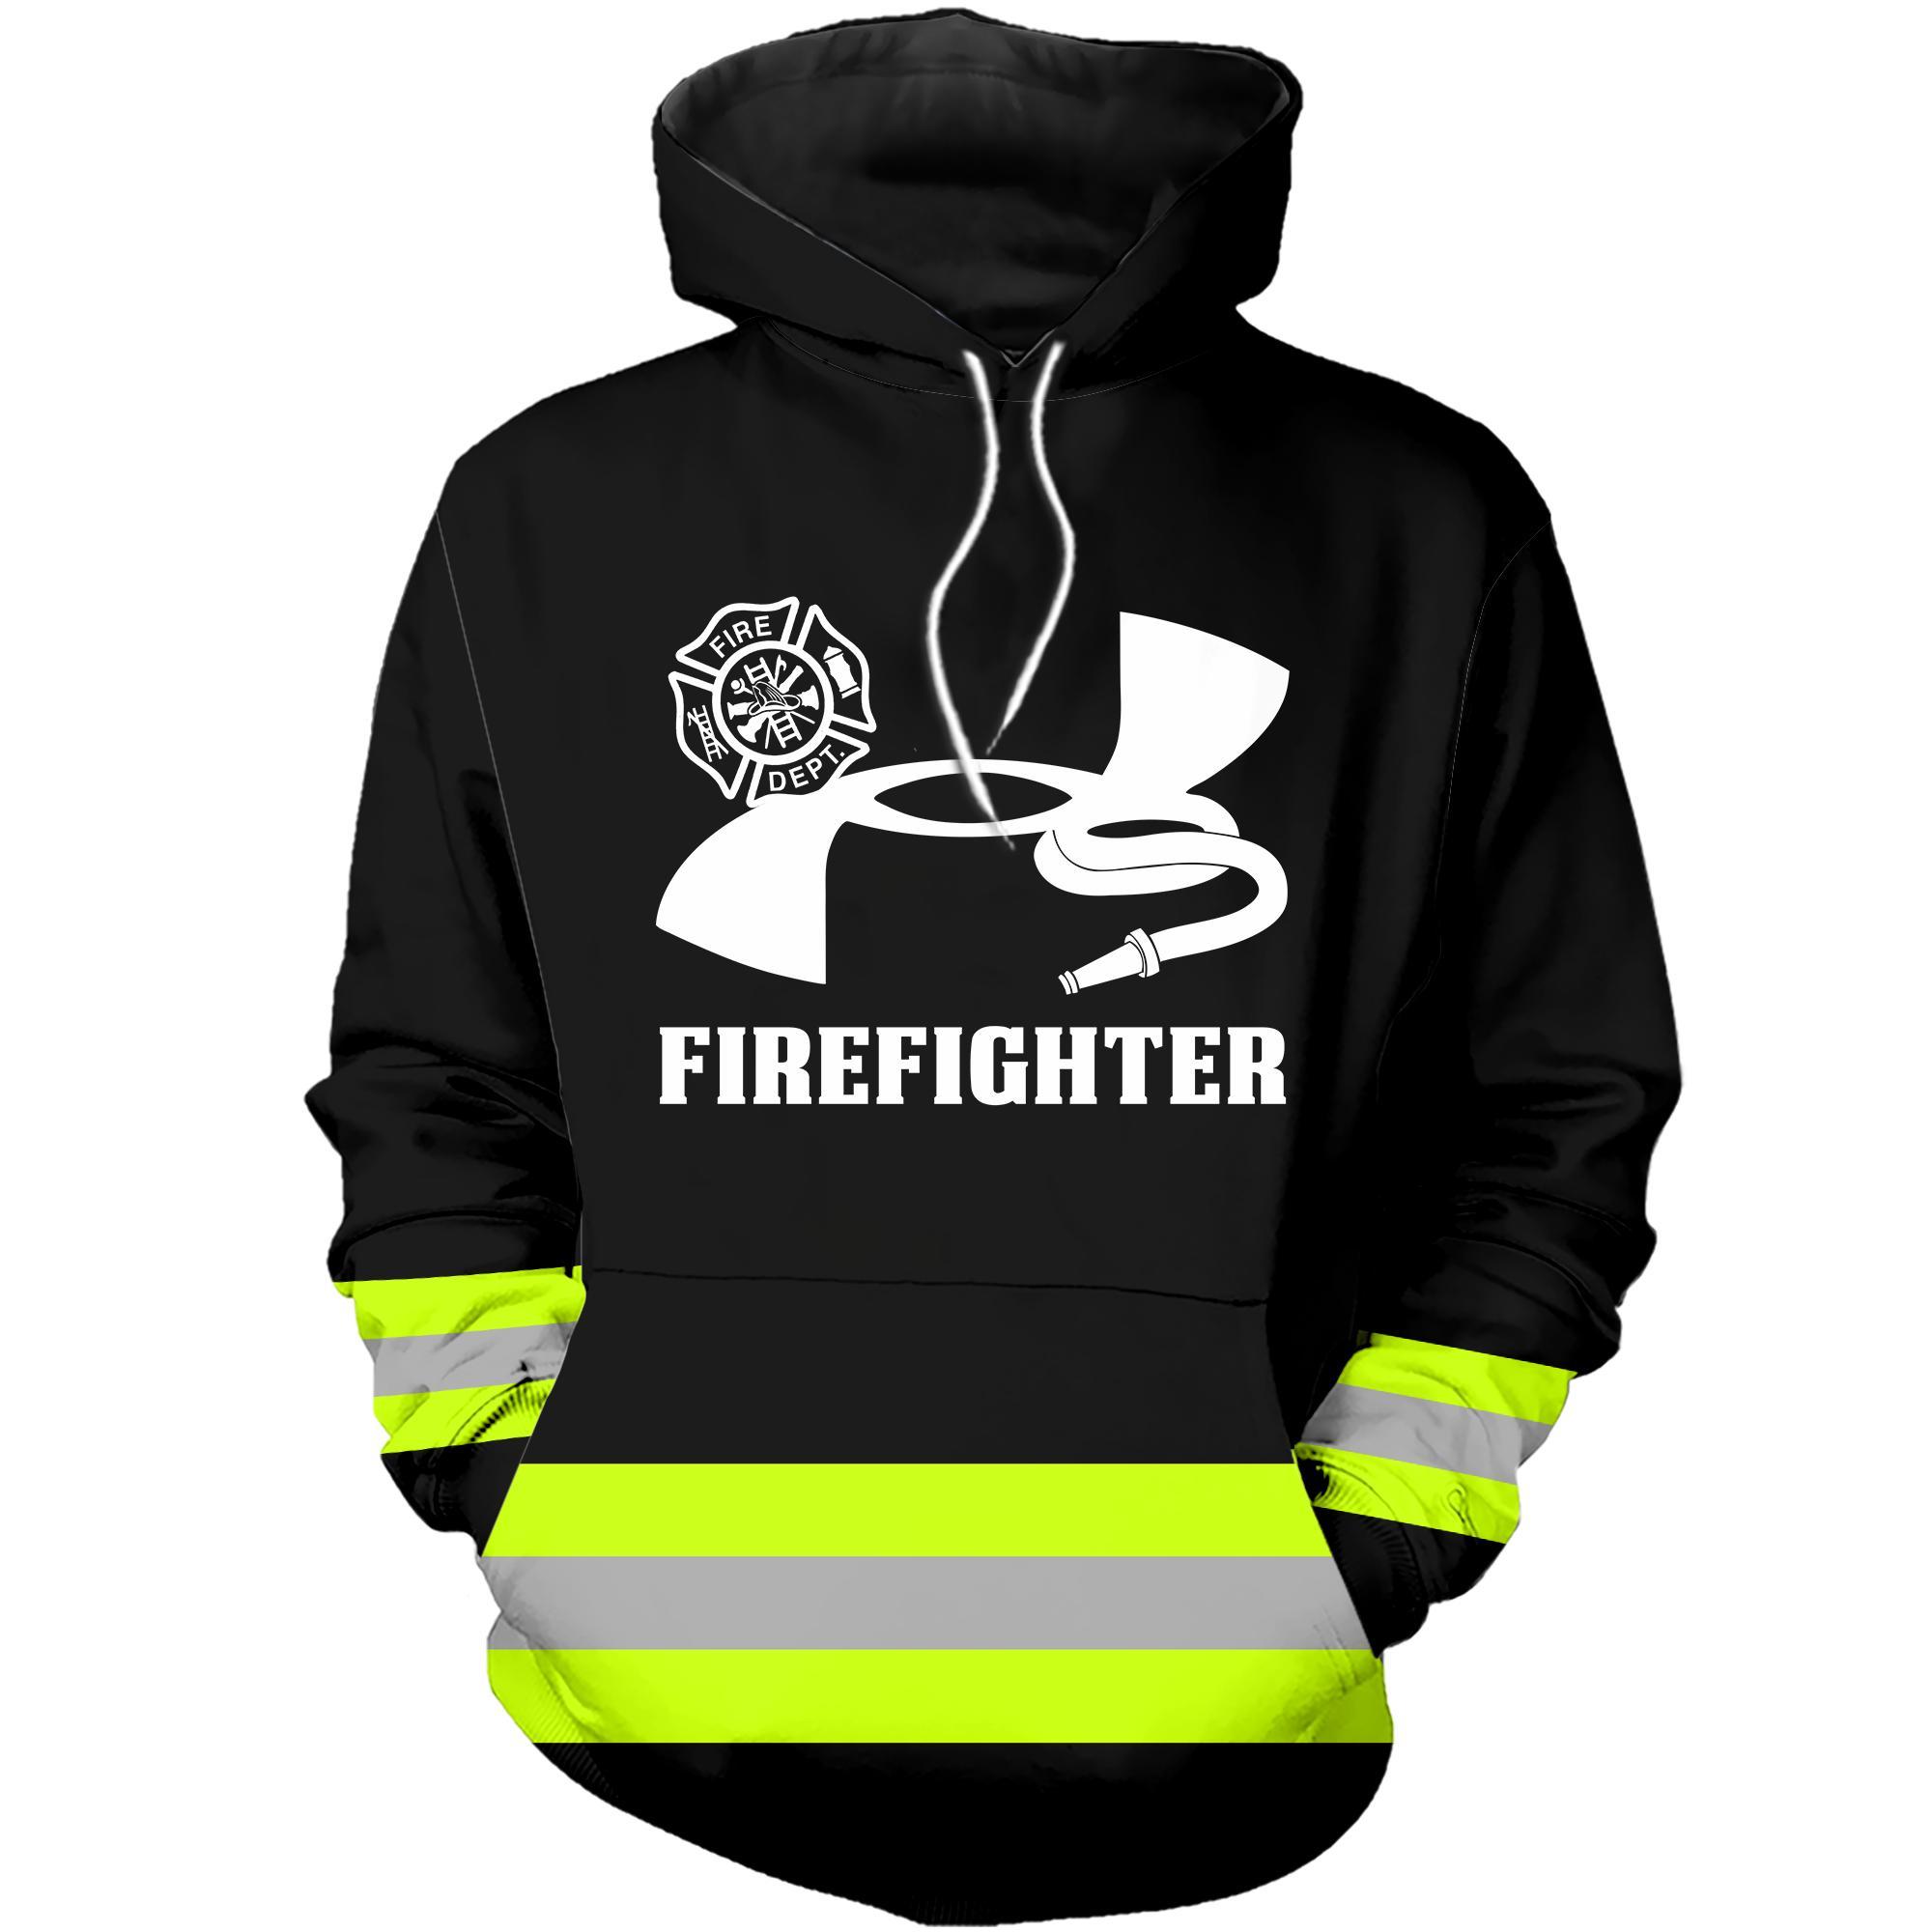 Under Armour Firefighter 3D hoodie - black